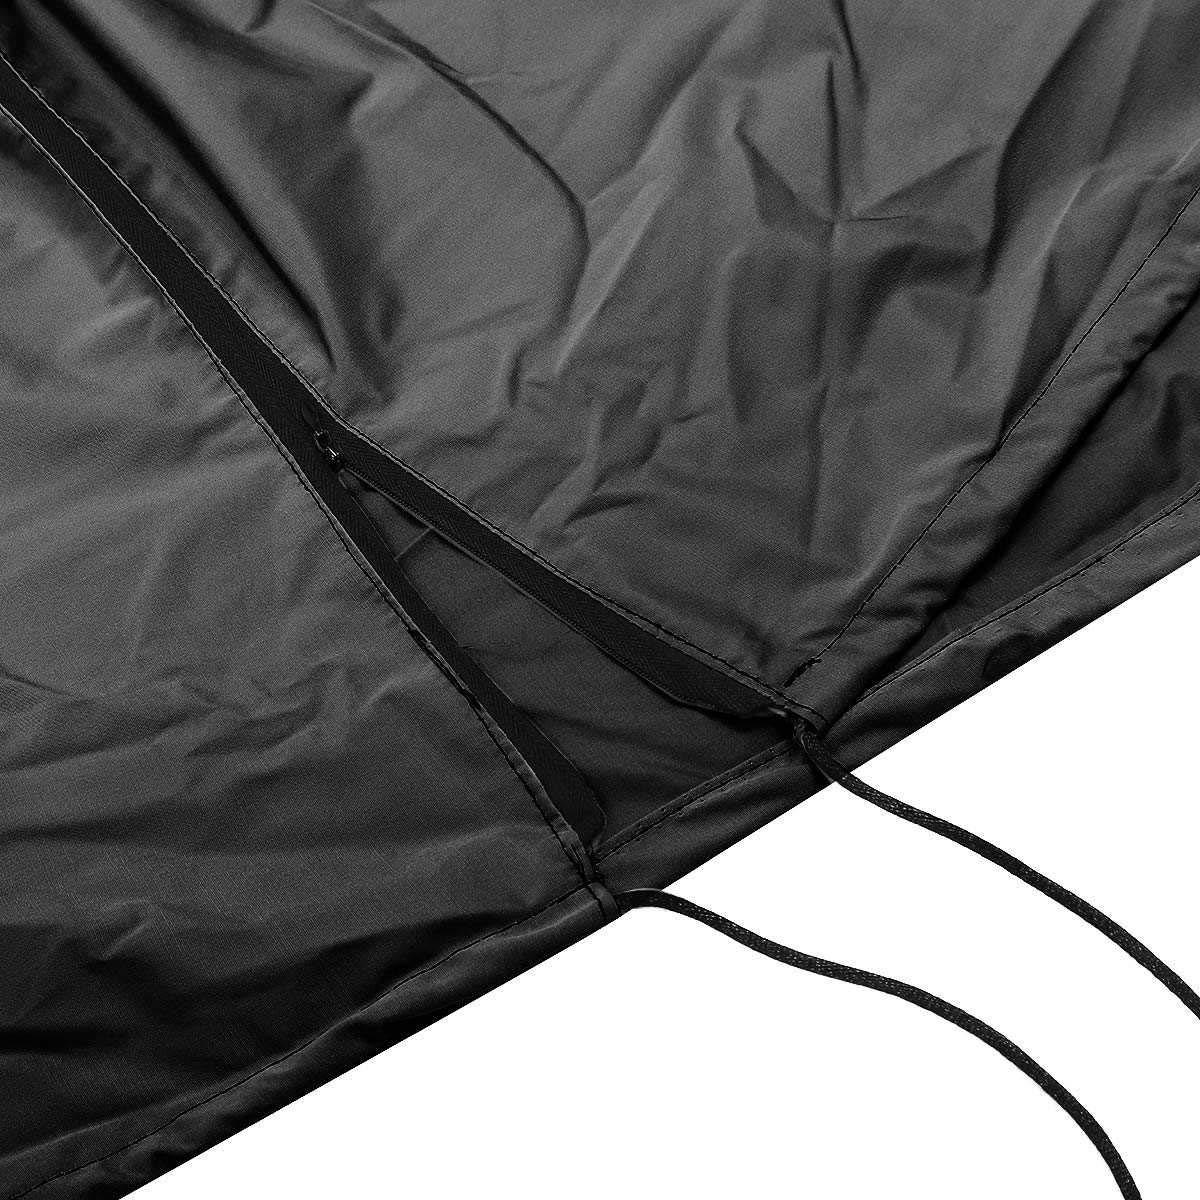 DELAMZ - Black Anti Dust Protector Cloth Waterproof Patio Heater Cover Outdoor Sun Rain Polyester Garden Courtyard Heater Cover Fabric by DELAMZ